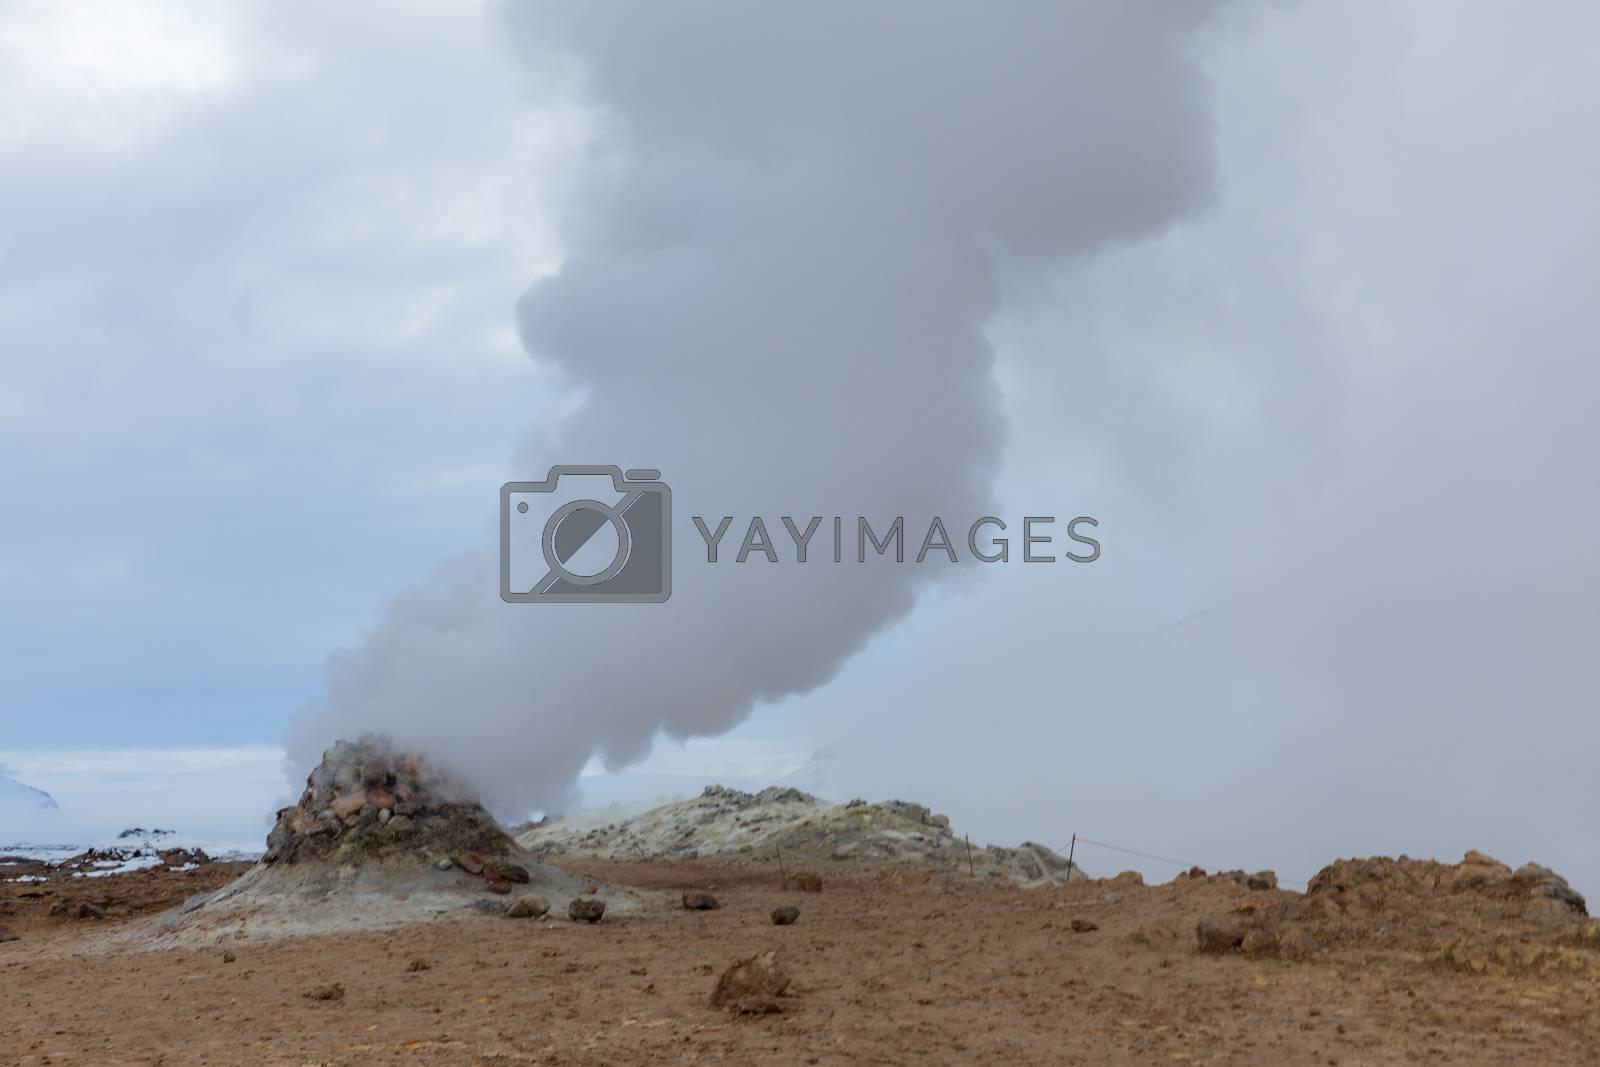 Hverir (Hverarond), the geothermal area, is a popular tourist attraction at  Lake Myvatn, Krafla northeastern region of Iceland, Europe.